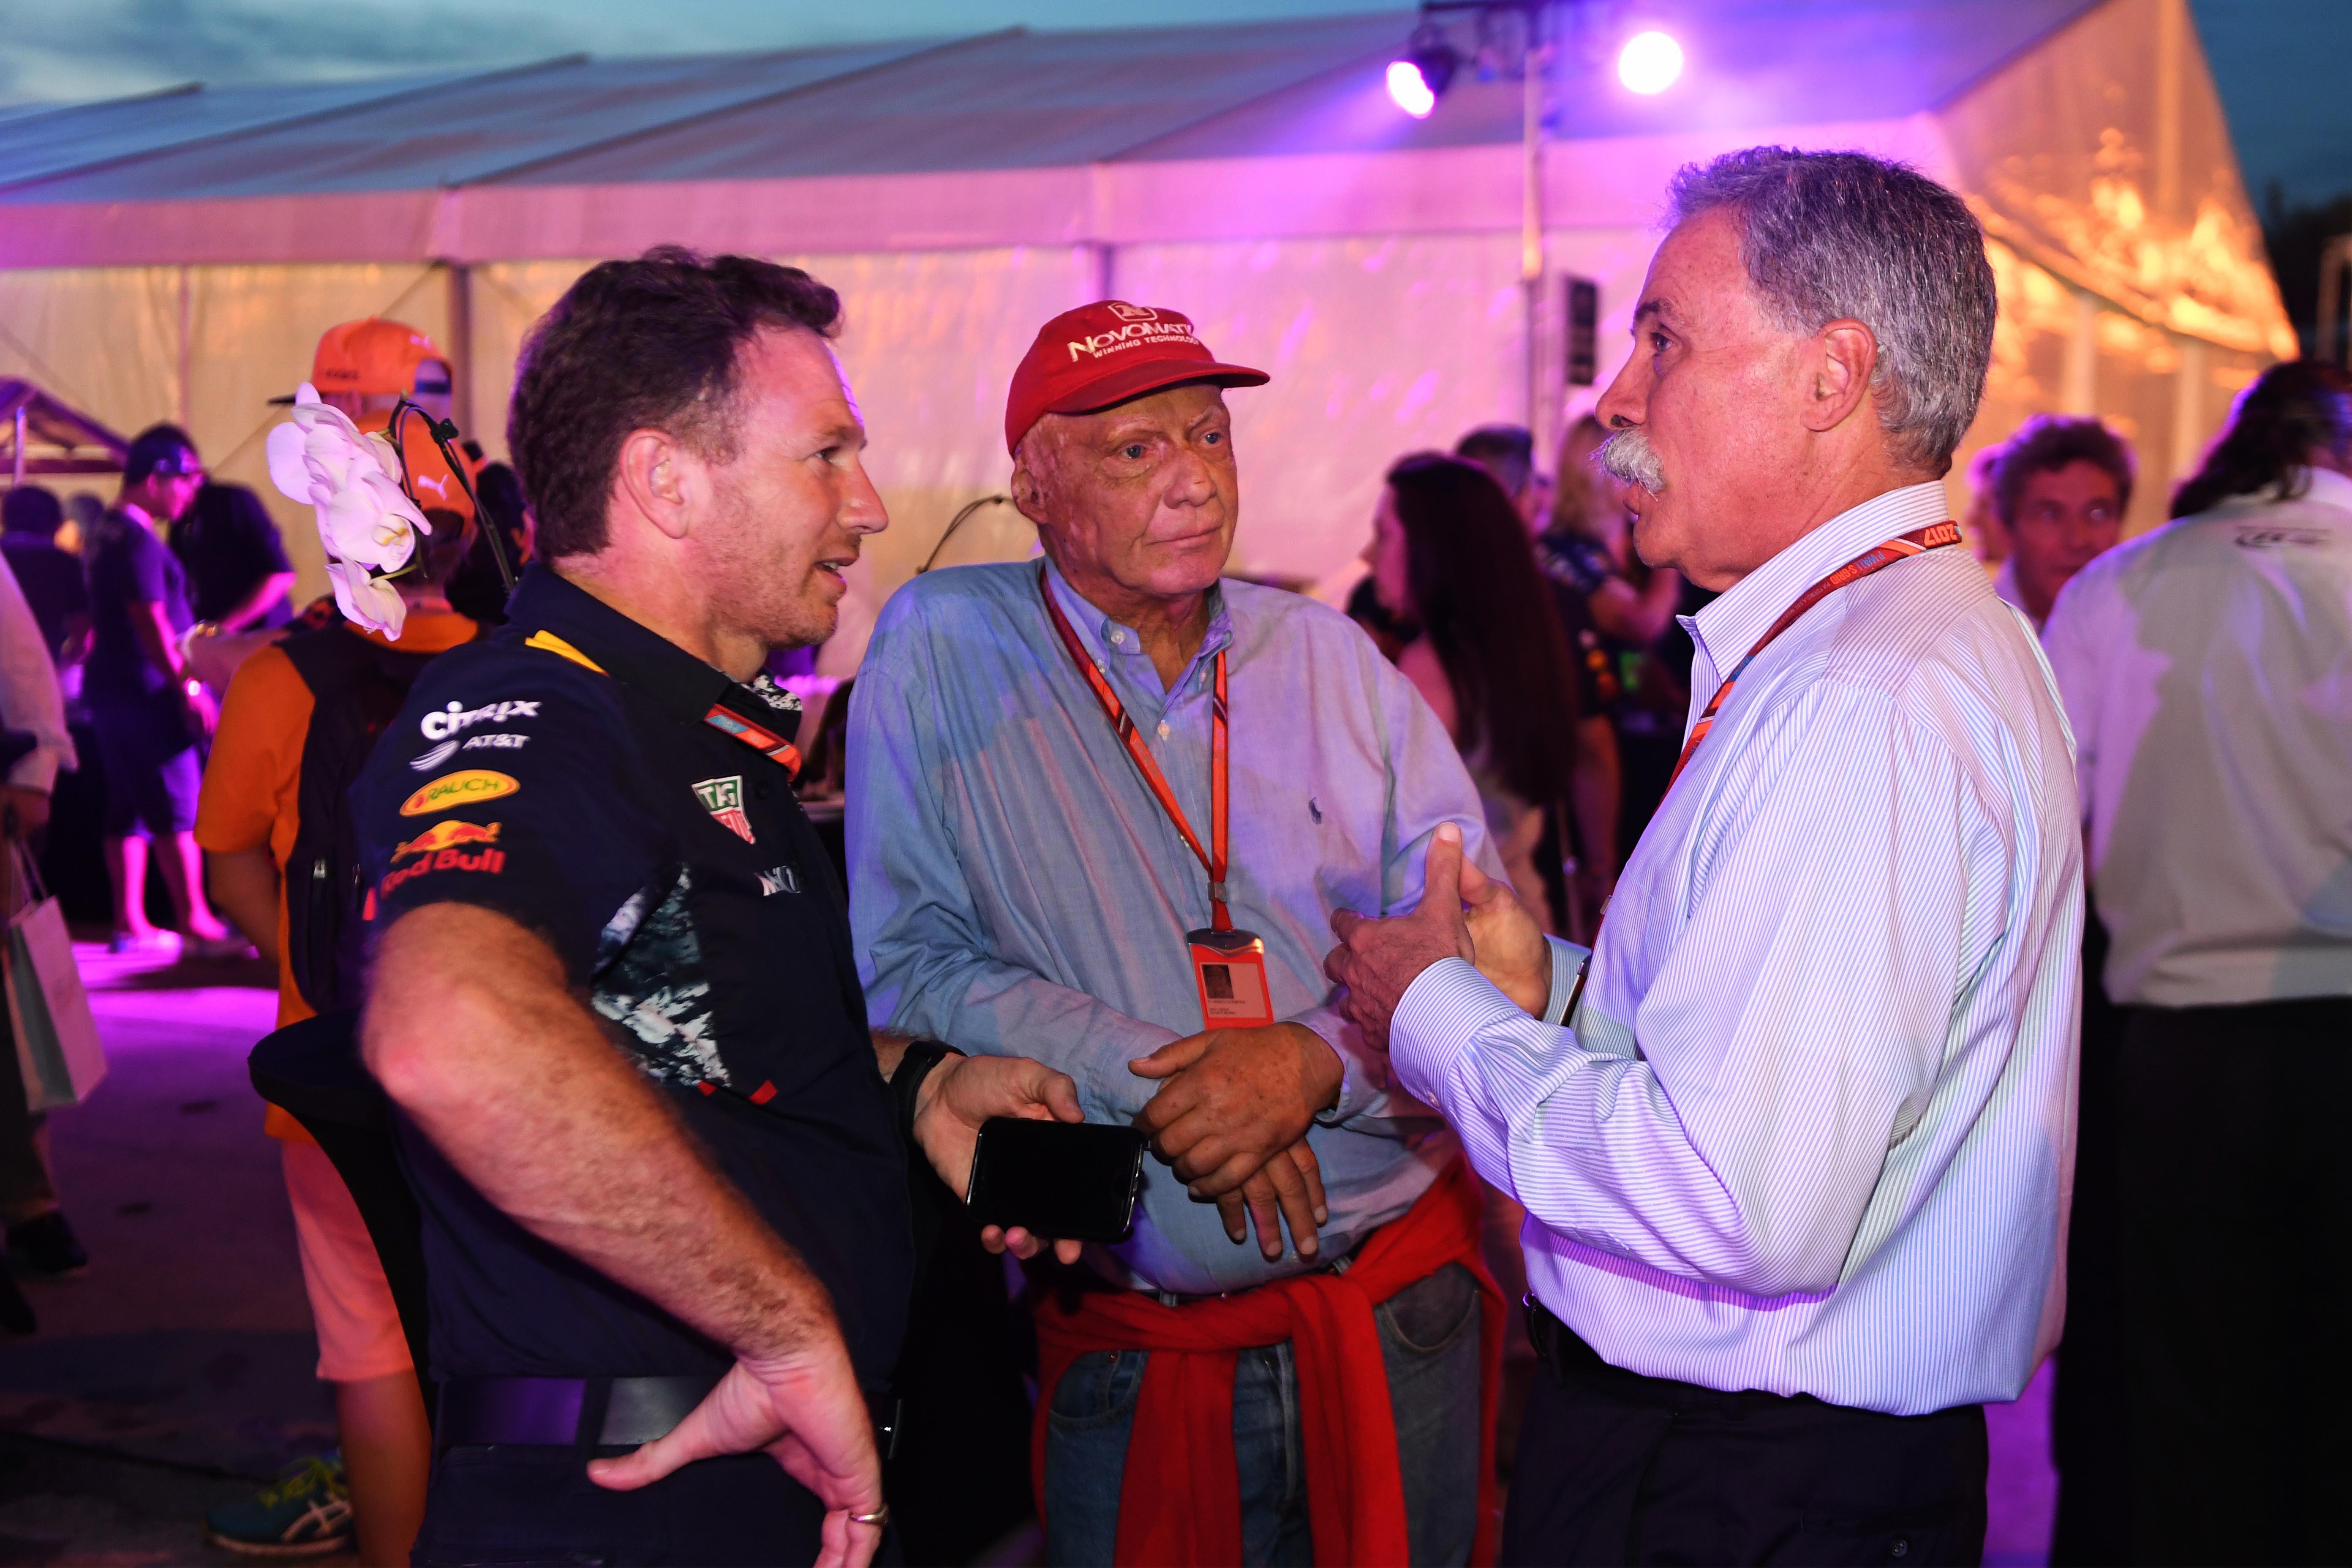 F1 - Liberty Media joue son avenir et? celui de la F1